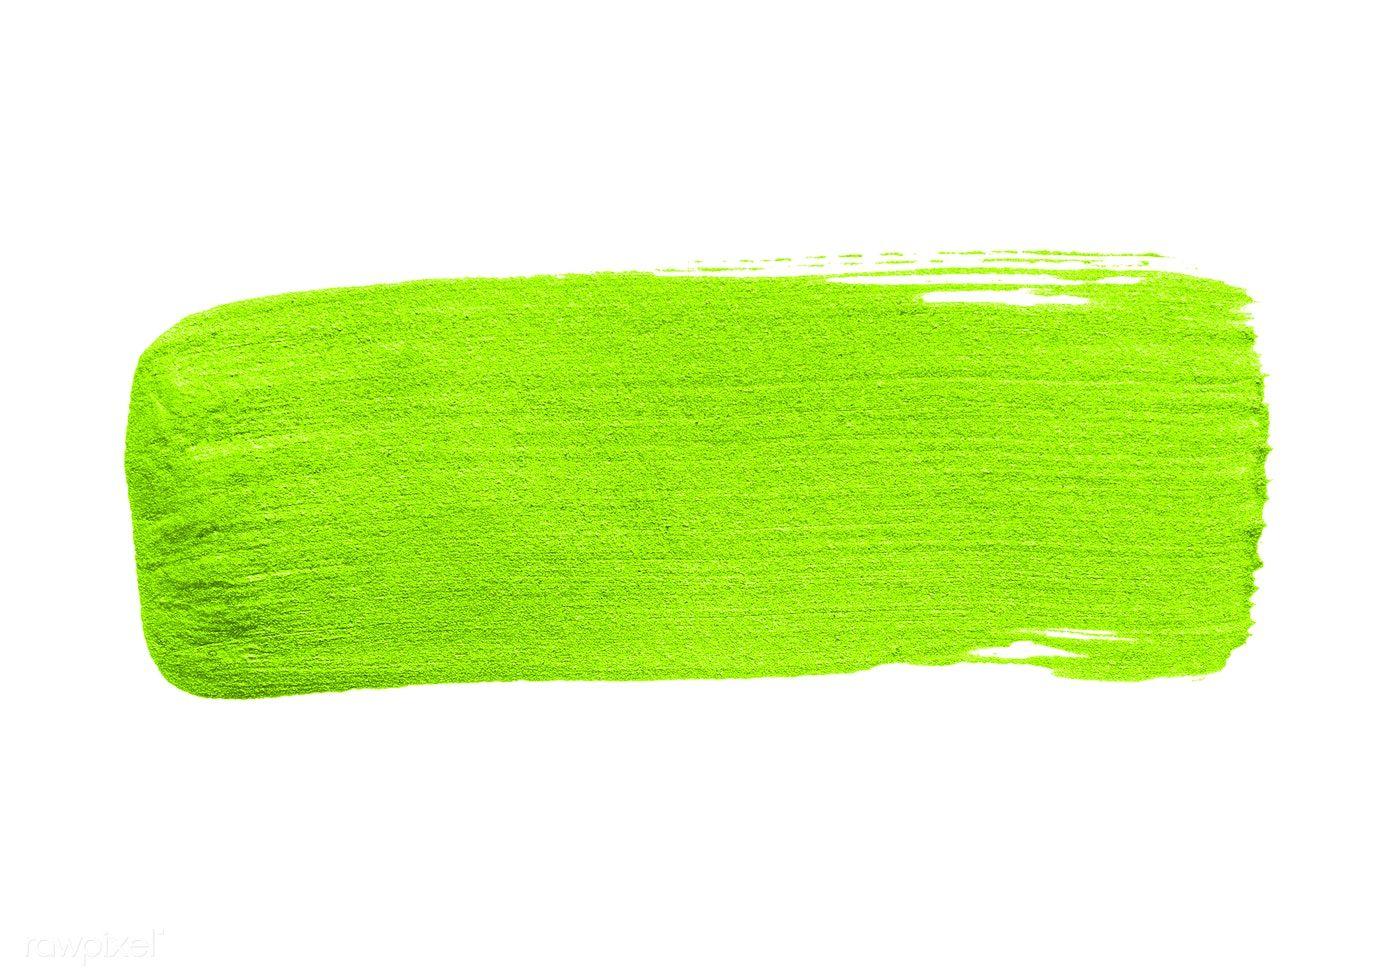 Download Premium Psd Of Neon Lime Green Brush Stroke 552699 Brush Strokes Watercolour Texture Background Blue Flower Wallpaper